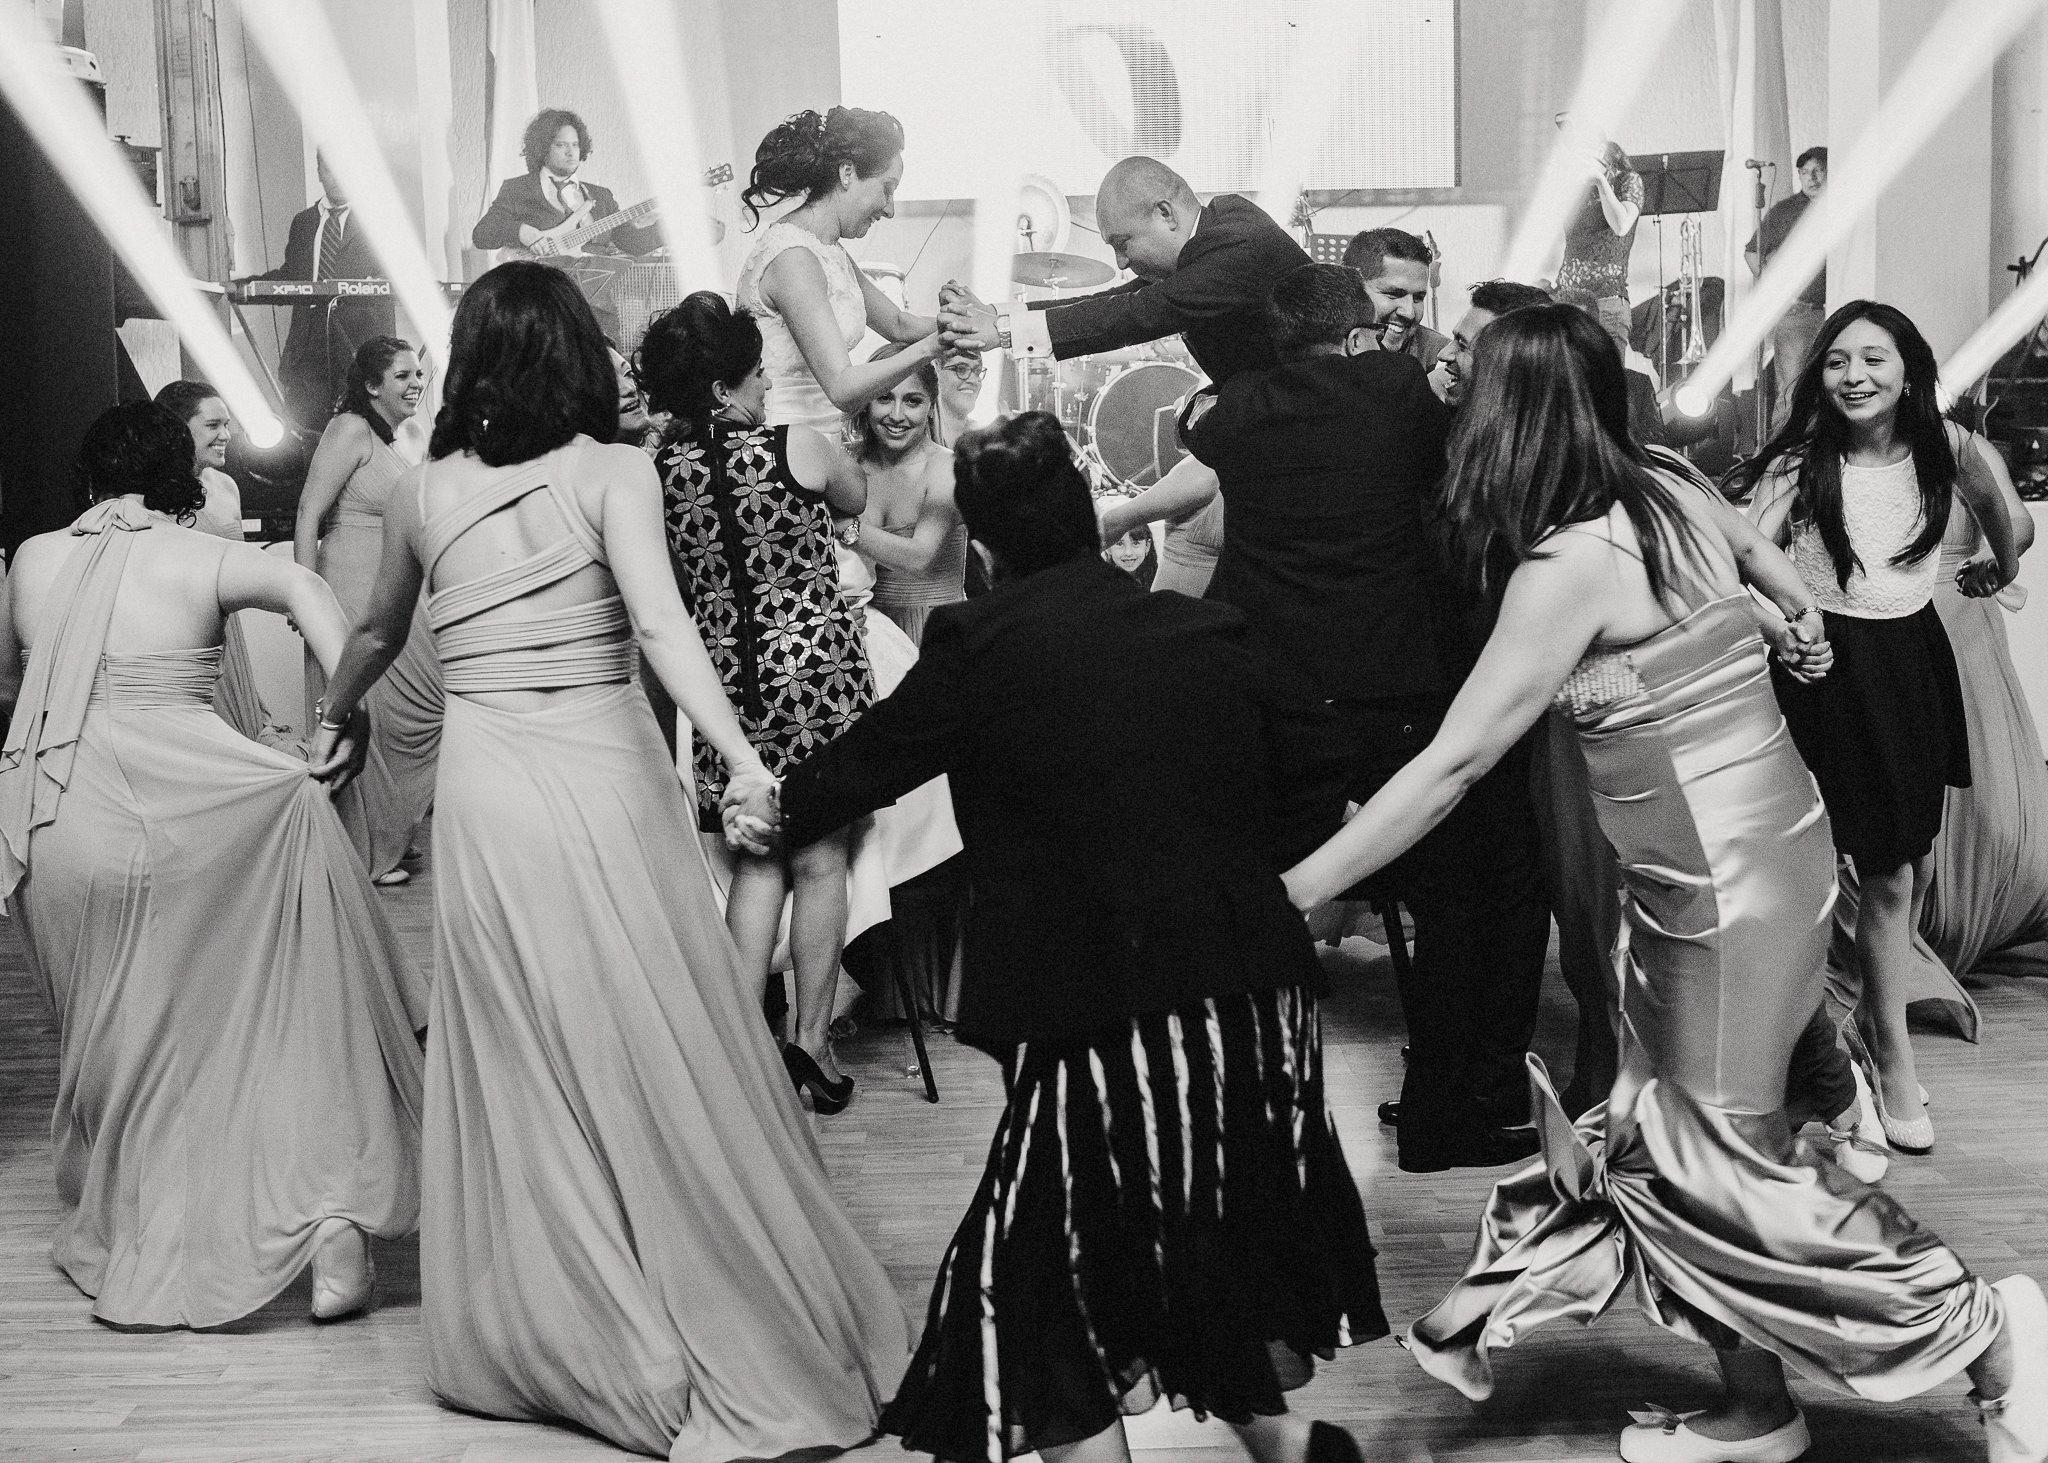 Wedding-Boda-Tulancingo-Hidalgo-Salon-Essenzia-Luis-Houdin-64-film